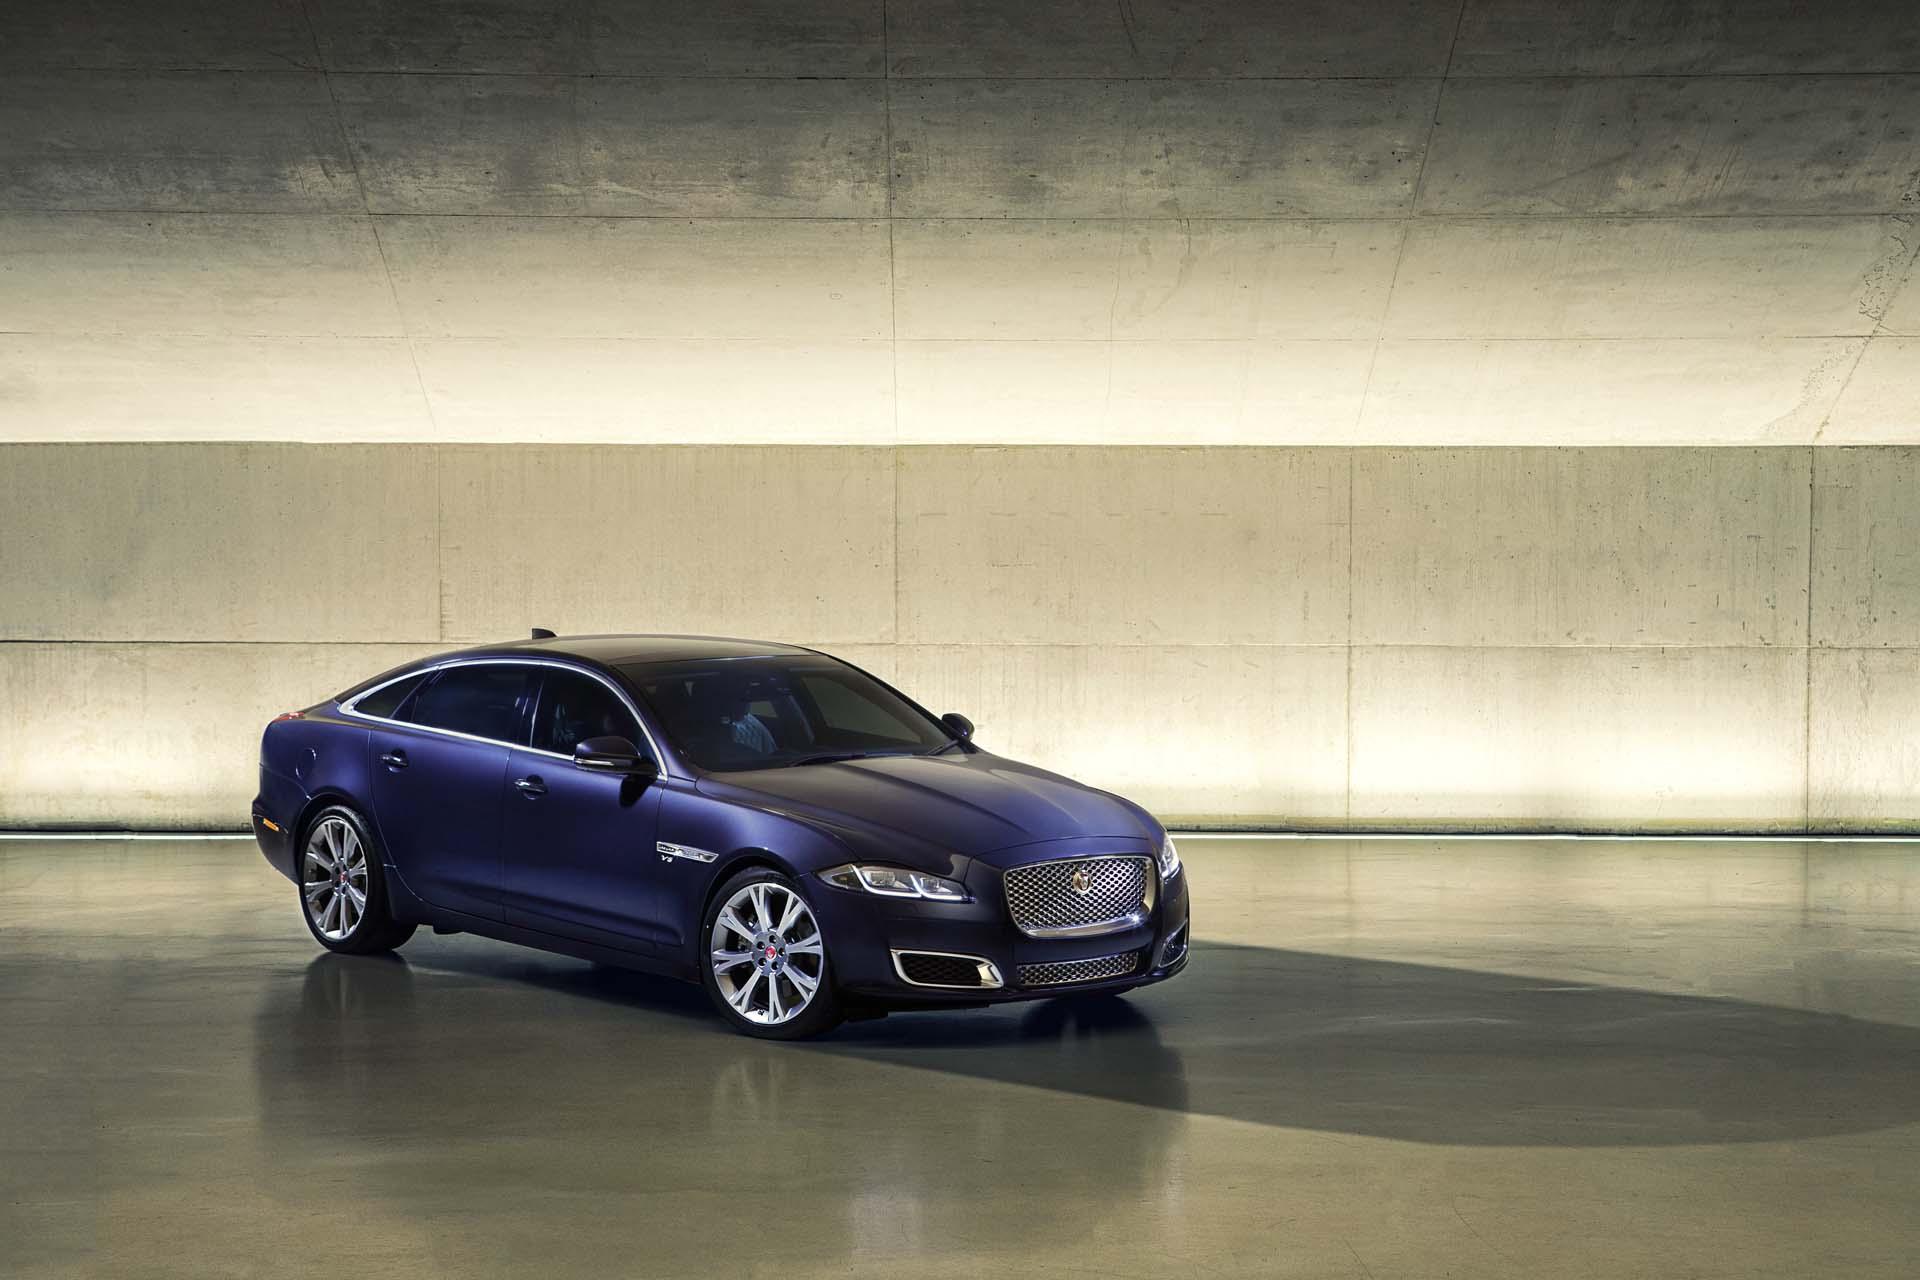 reviews view xjl review rear exterior jaguar ca car wheels sedan